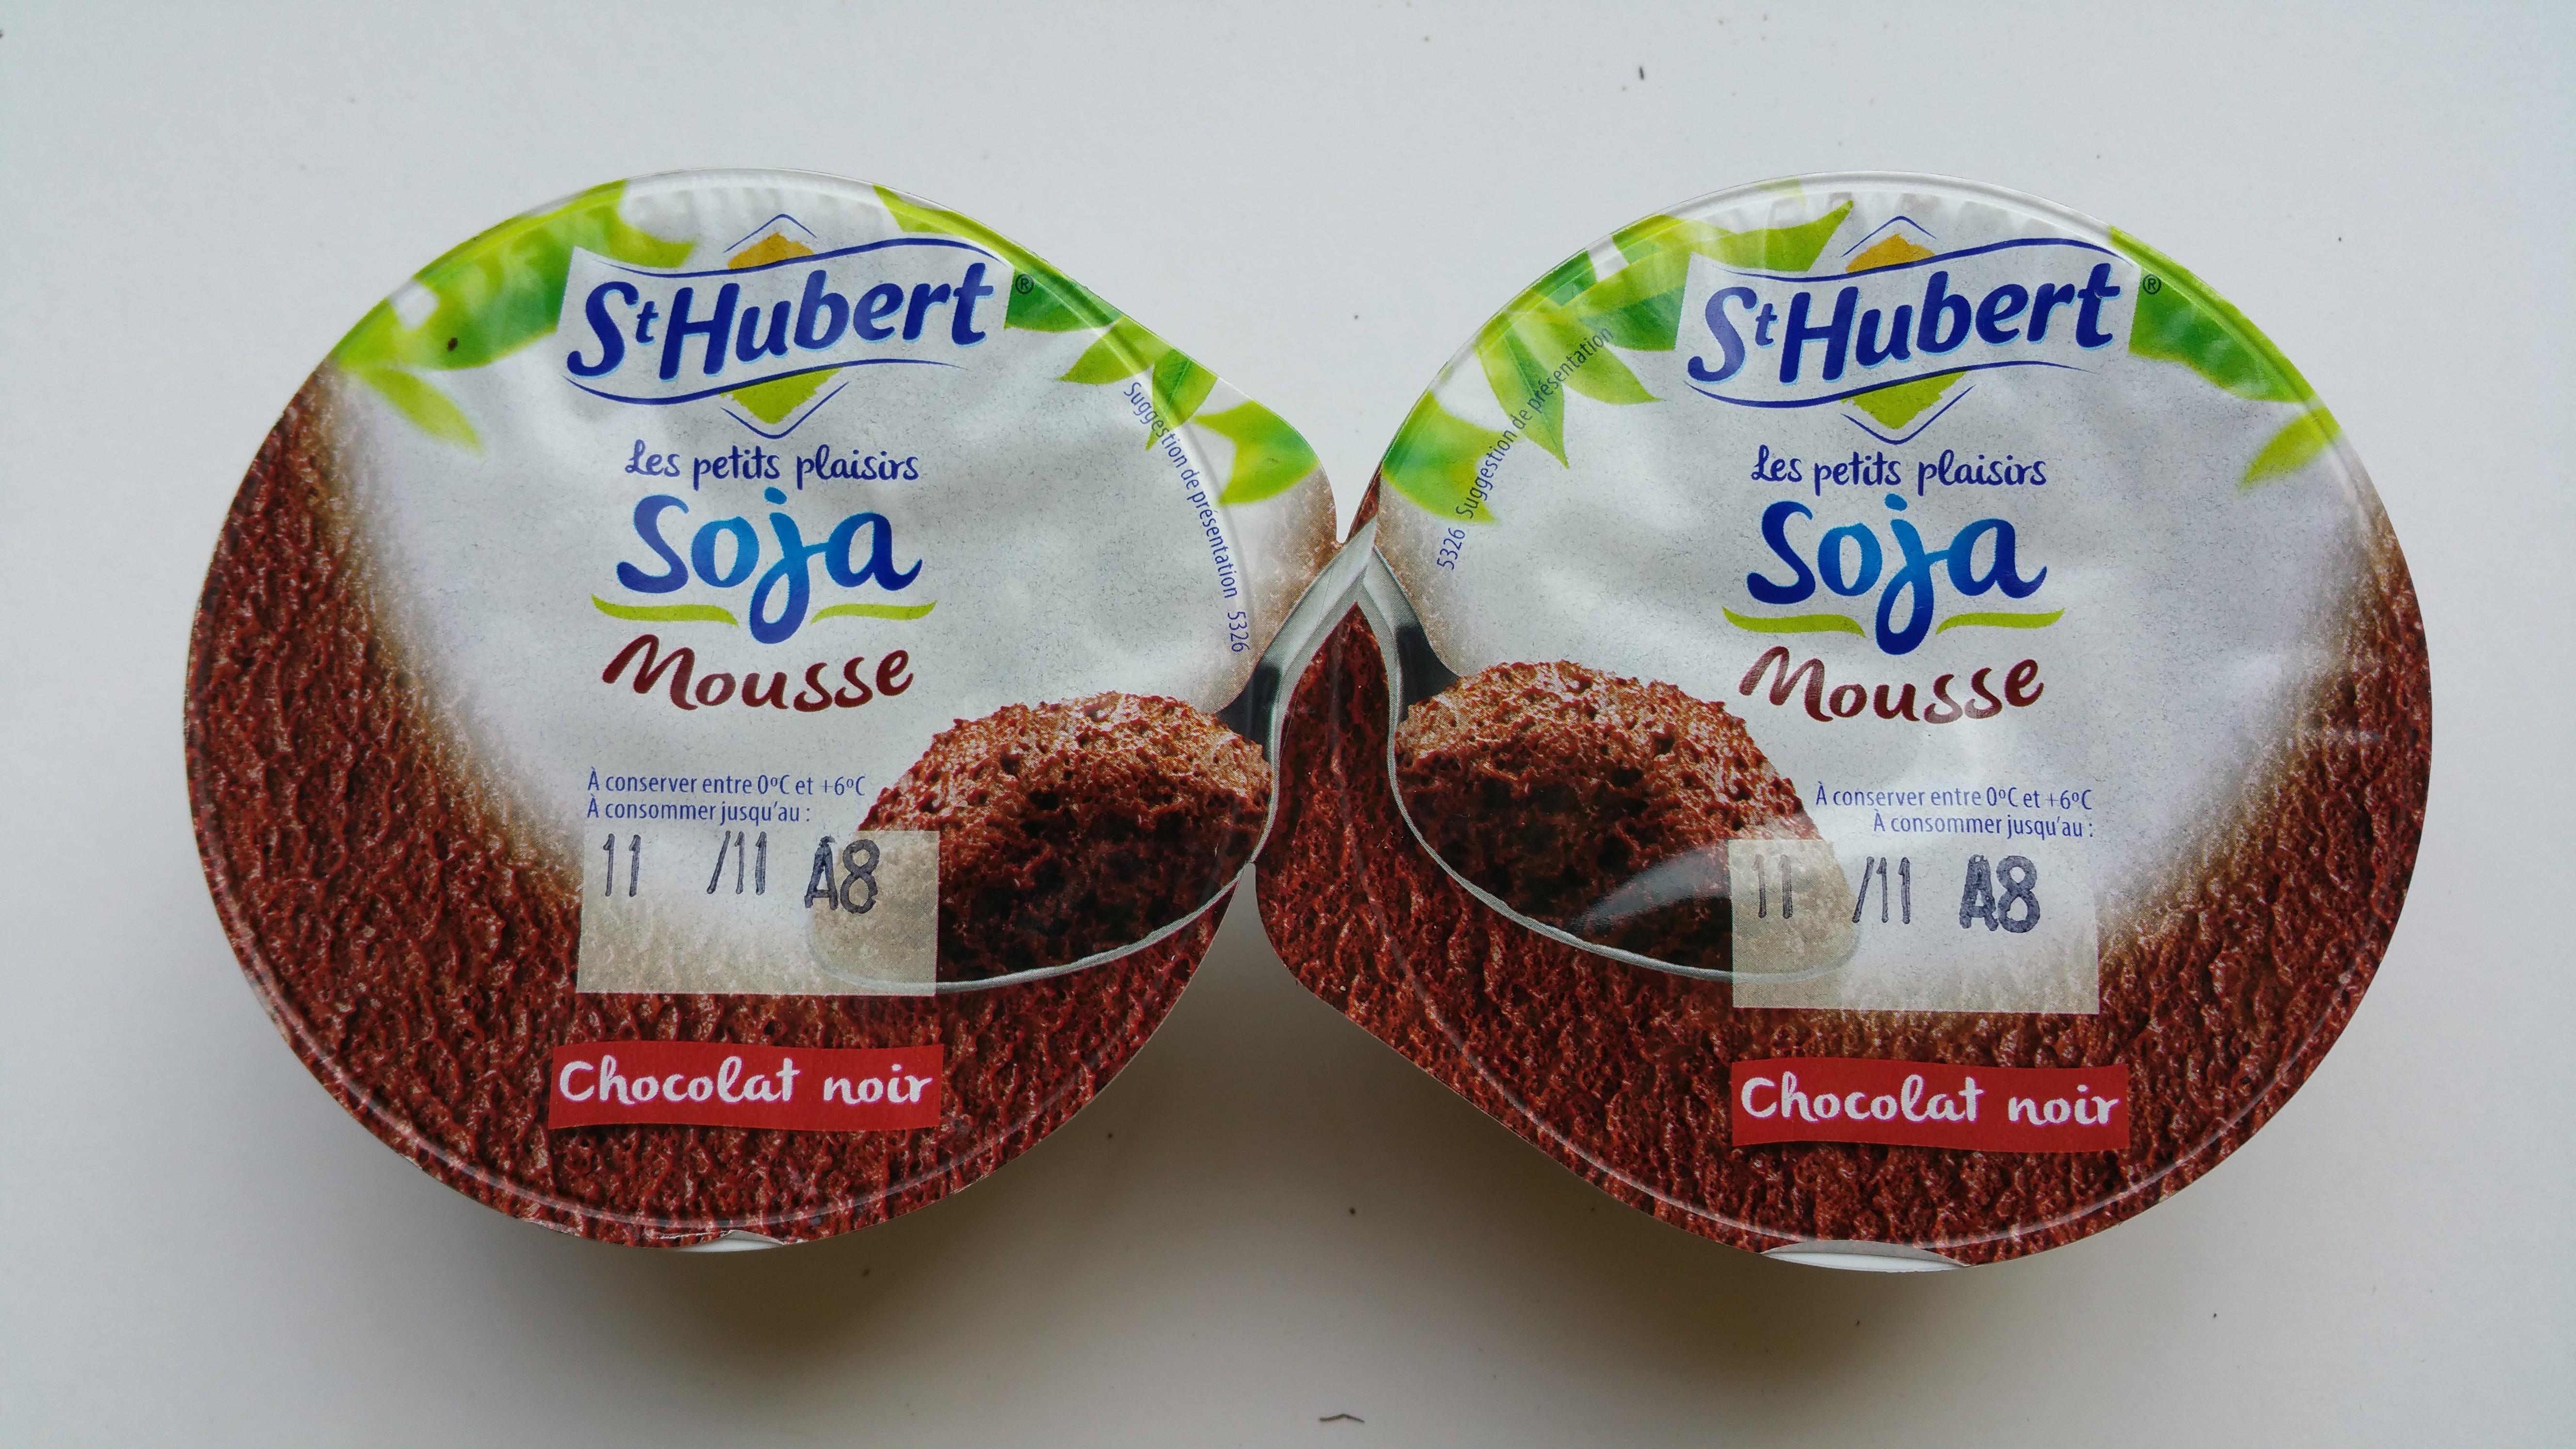 St-Hubert-Petits-Plaisirs-Soja®-Mousse-chocolat-noir - St-Hubert-Les-Petits-Plaisirs-Soja®-Mousse-chocolat-noir-6.jpg